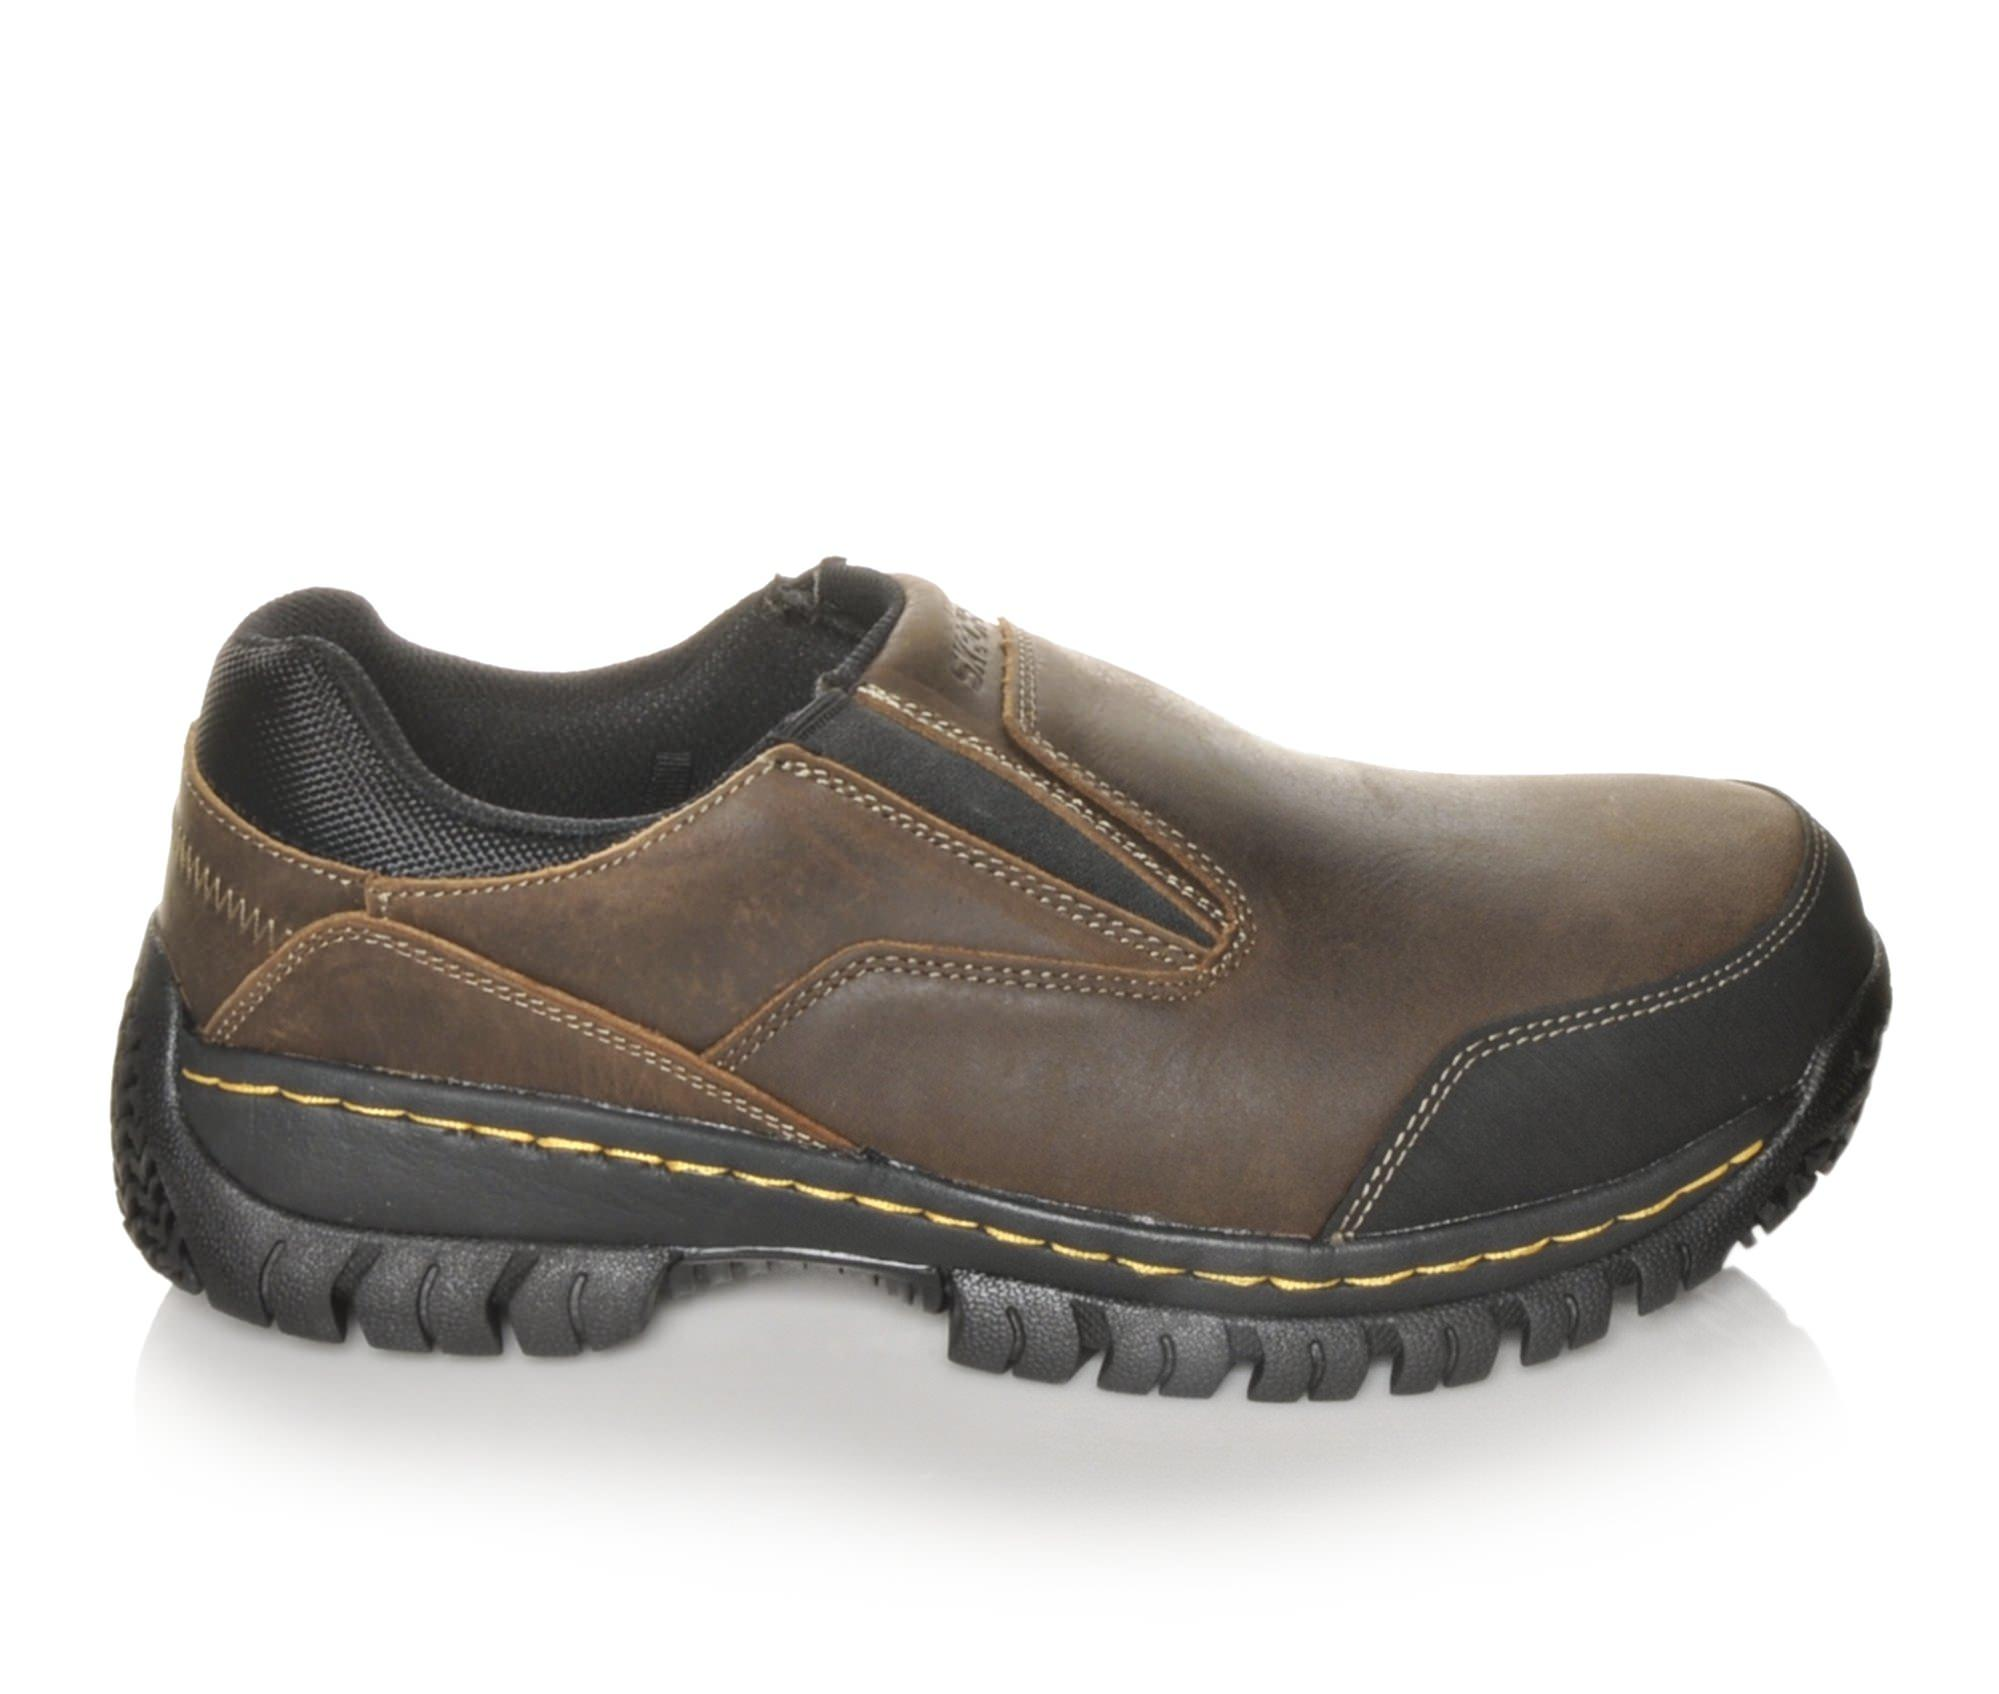 Skechers Work 77066 Hartan Steel Toe Men's Boots (Brown Leather)